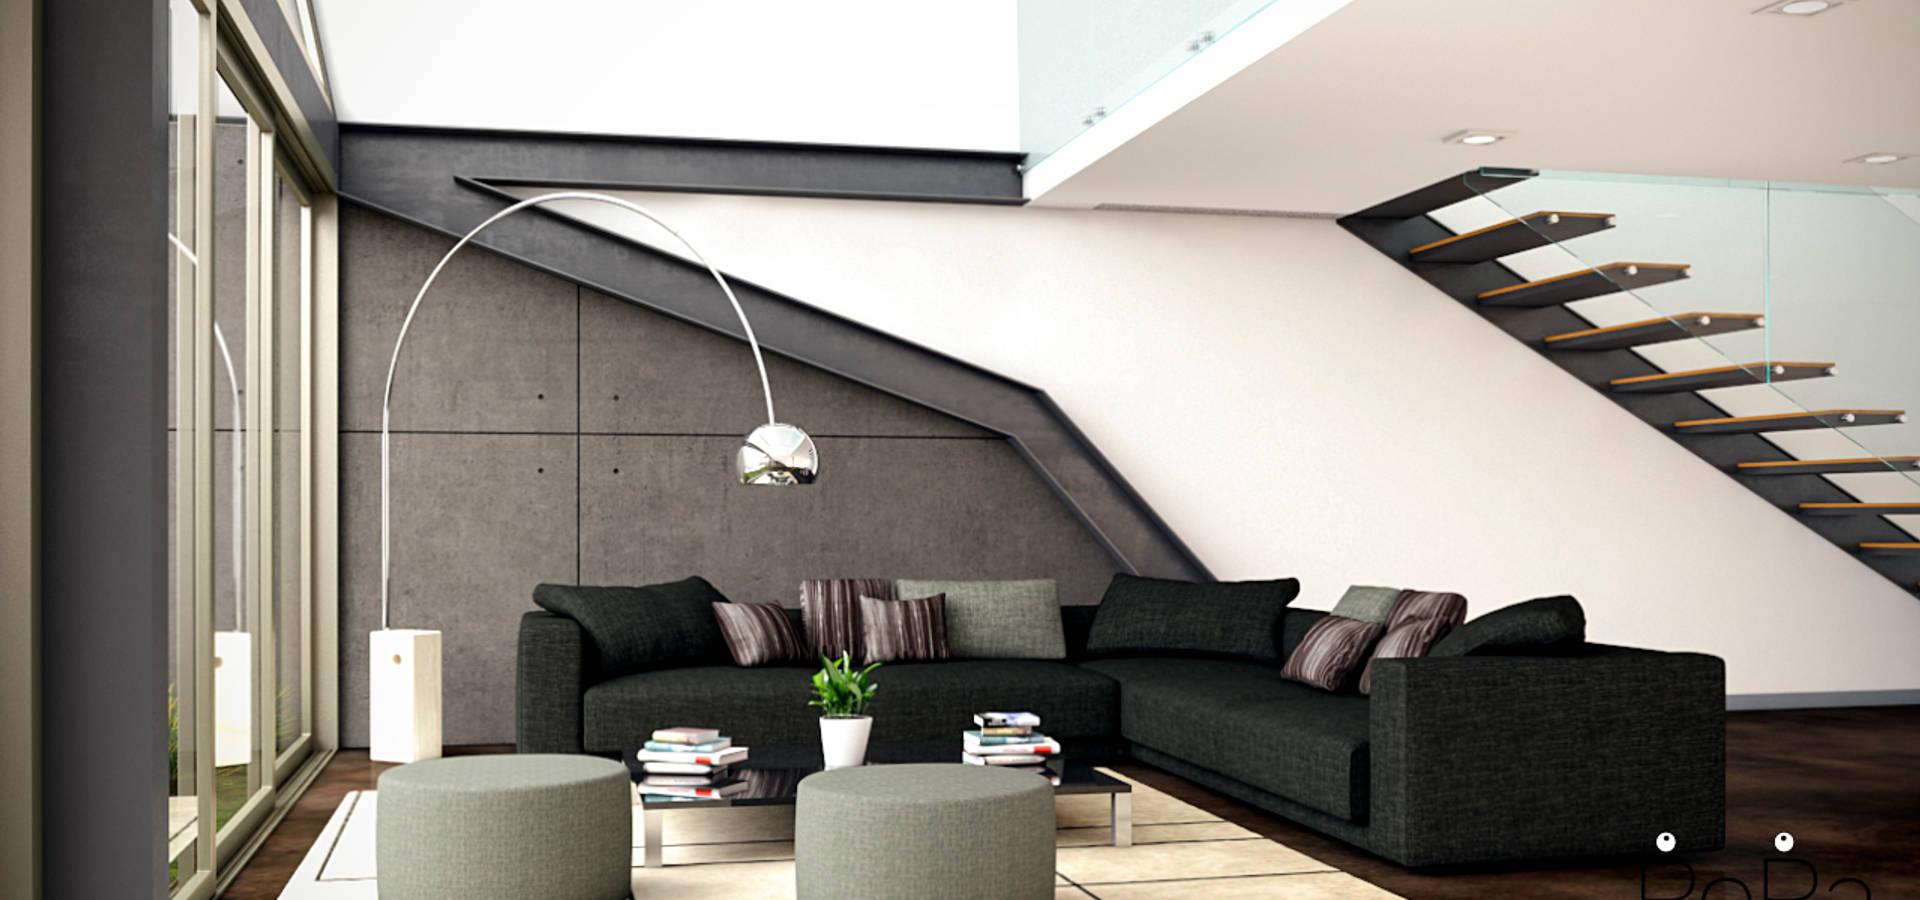 LA RORA Interiorismo & Arquitectura